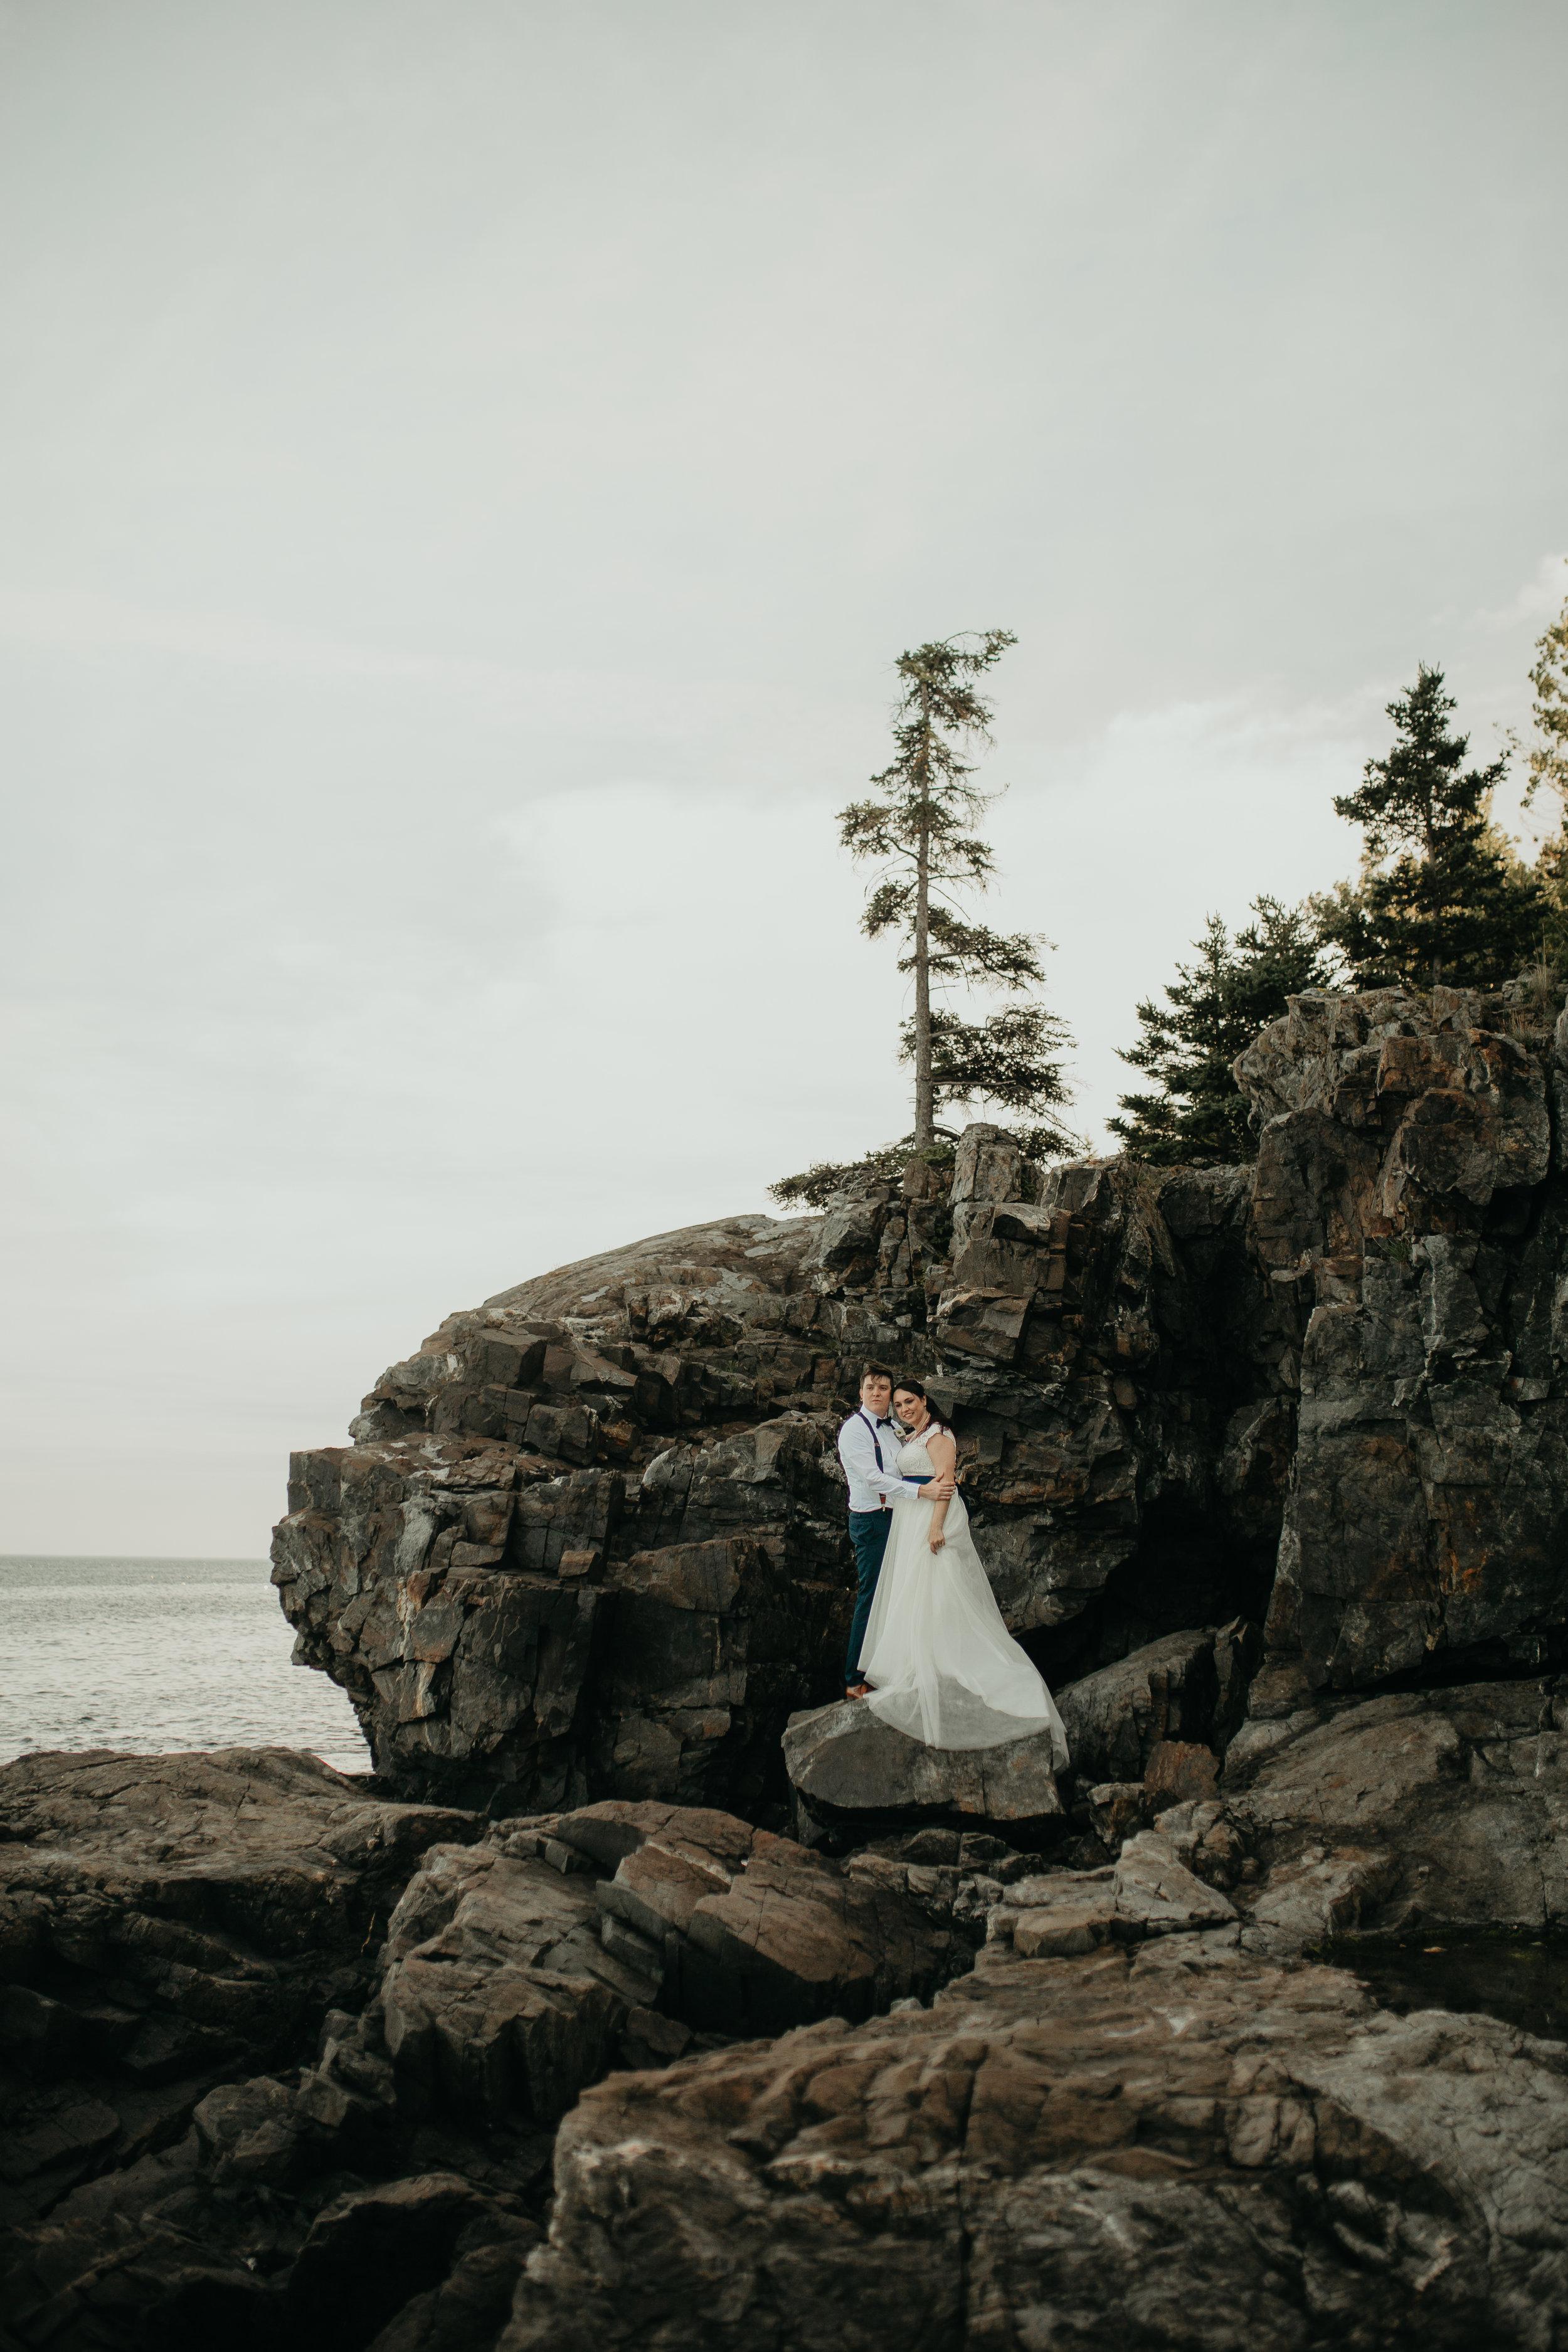 nicole-daacke-photography-Elopement-rocky-shoreline-coast-Acadia-National-Park-elopement-photographer-inspiration-maine-elopement-otter-cliffs-schoonic-head-point-39.jpg